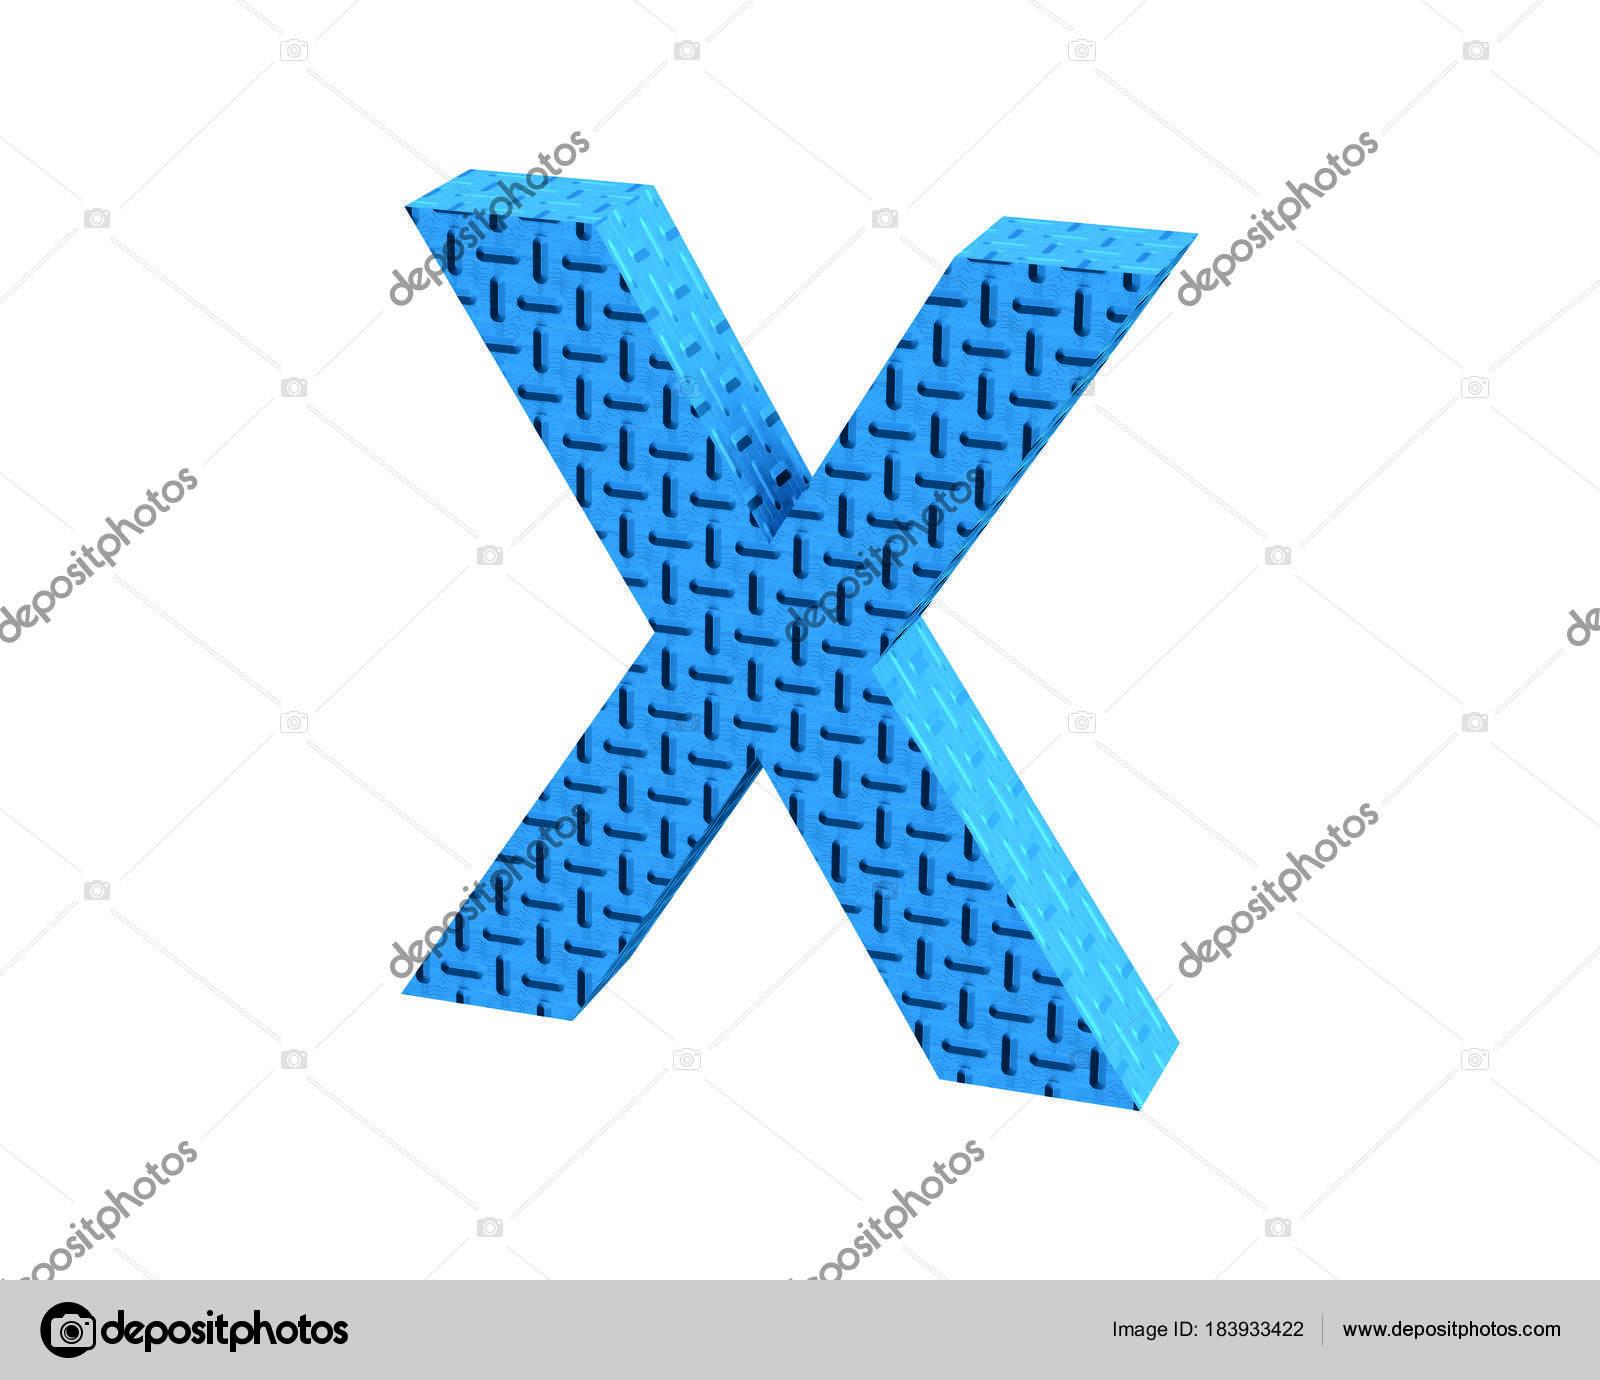 3D rendering Font Plastic blue treadplate capital X u2014 Photo by dhz-ontwerpen@hotmail.com  sc 1 st  Depositphotos & Font Plastic blue treadplate capital X render u2014 Stock Photo © dhz ...